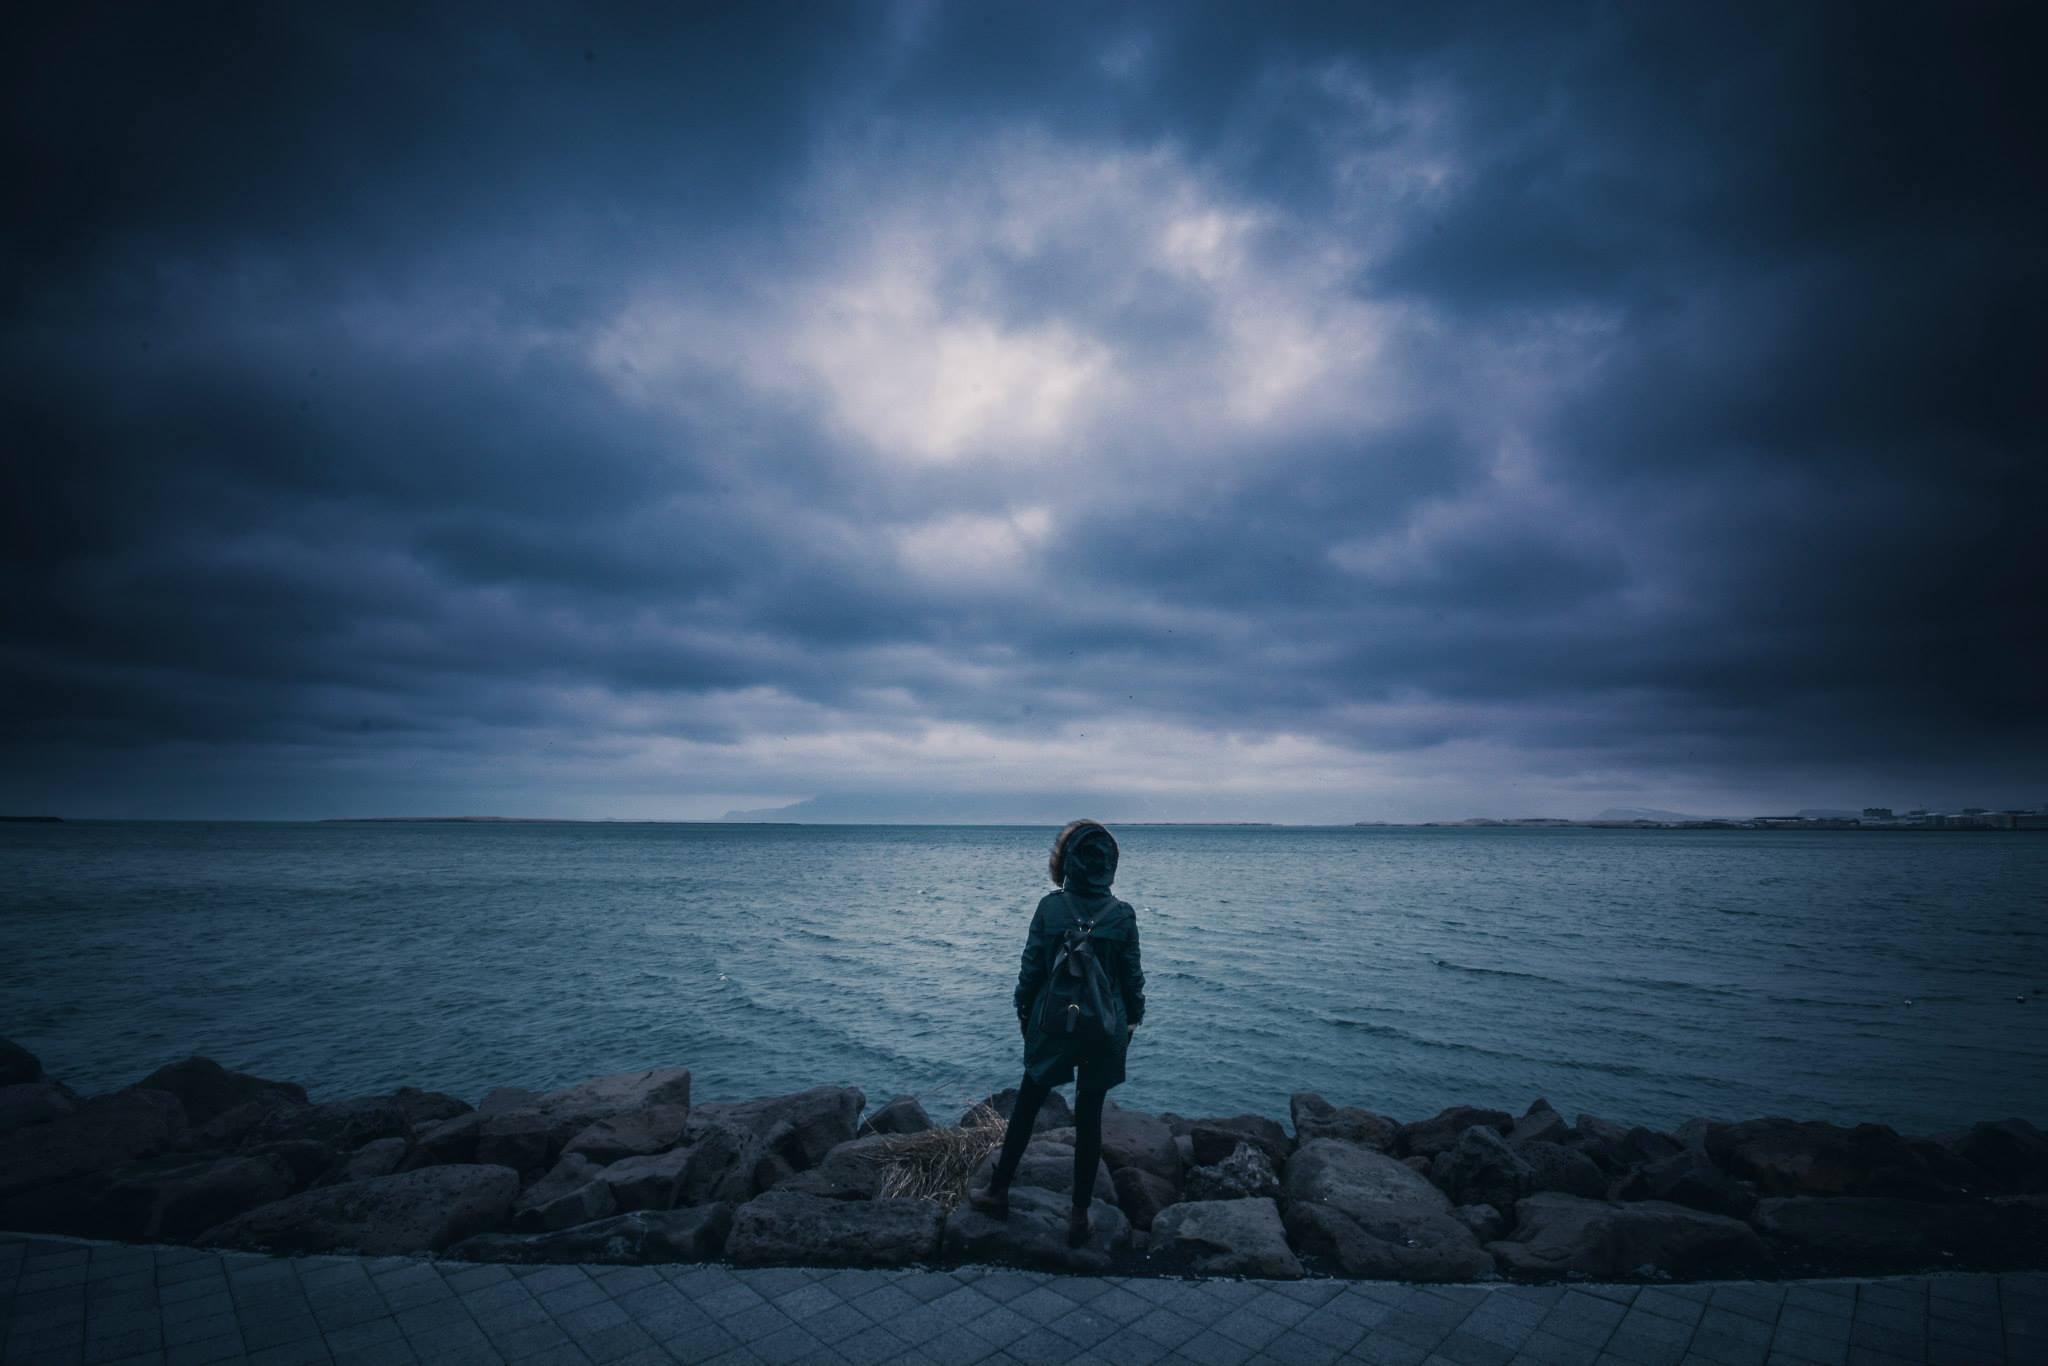 Solitude happiness stories